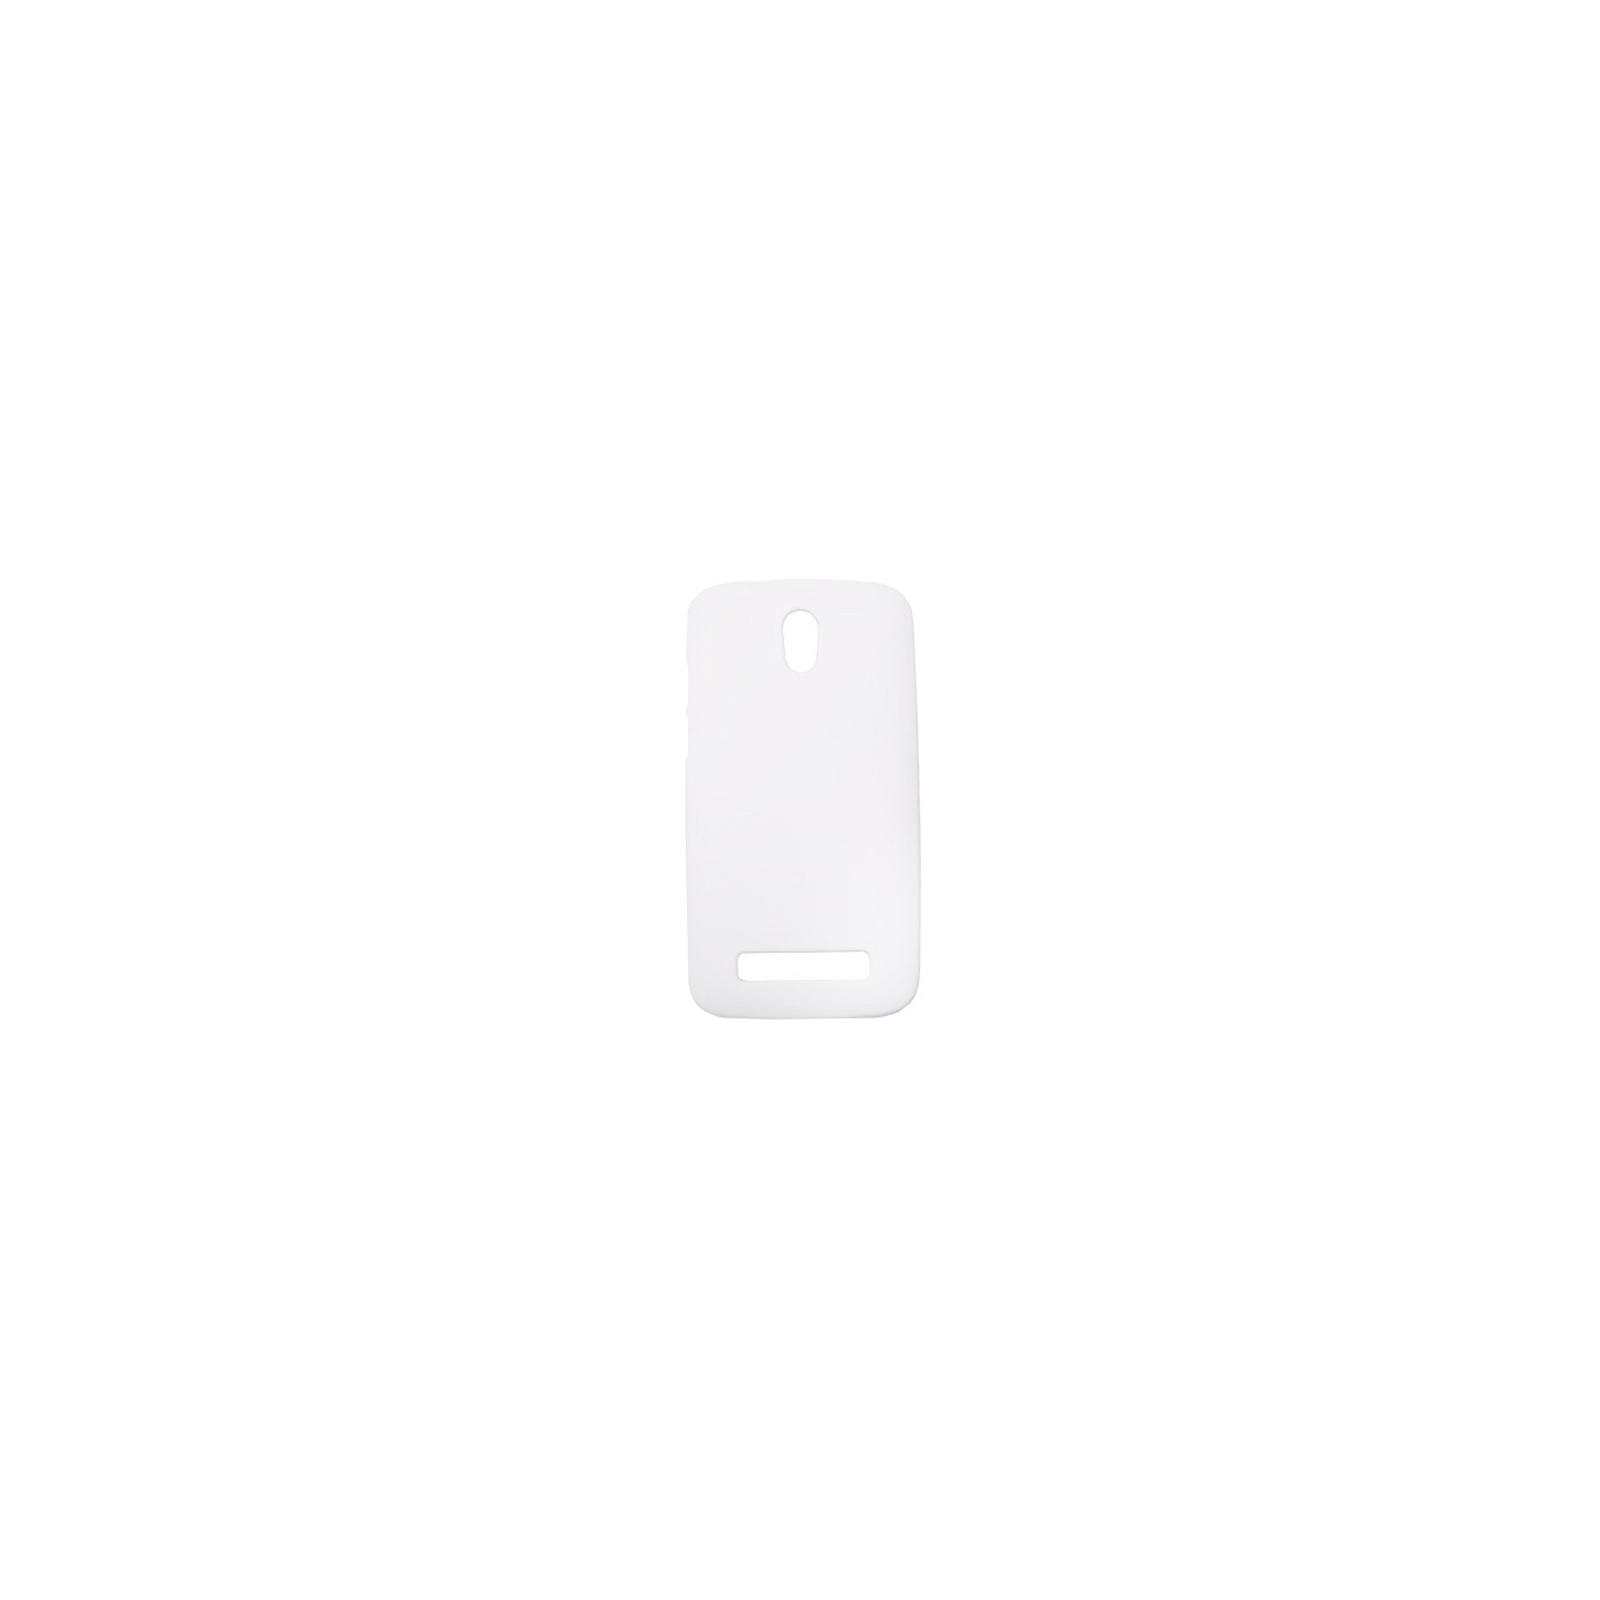 Чехол для моб. телефона Drobak для HTC Desire 500 /ElasticPU/White (218864)